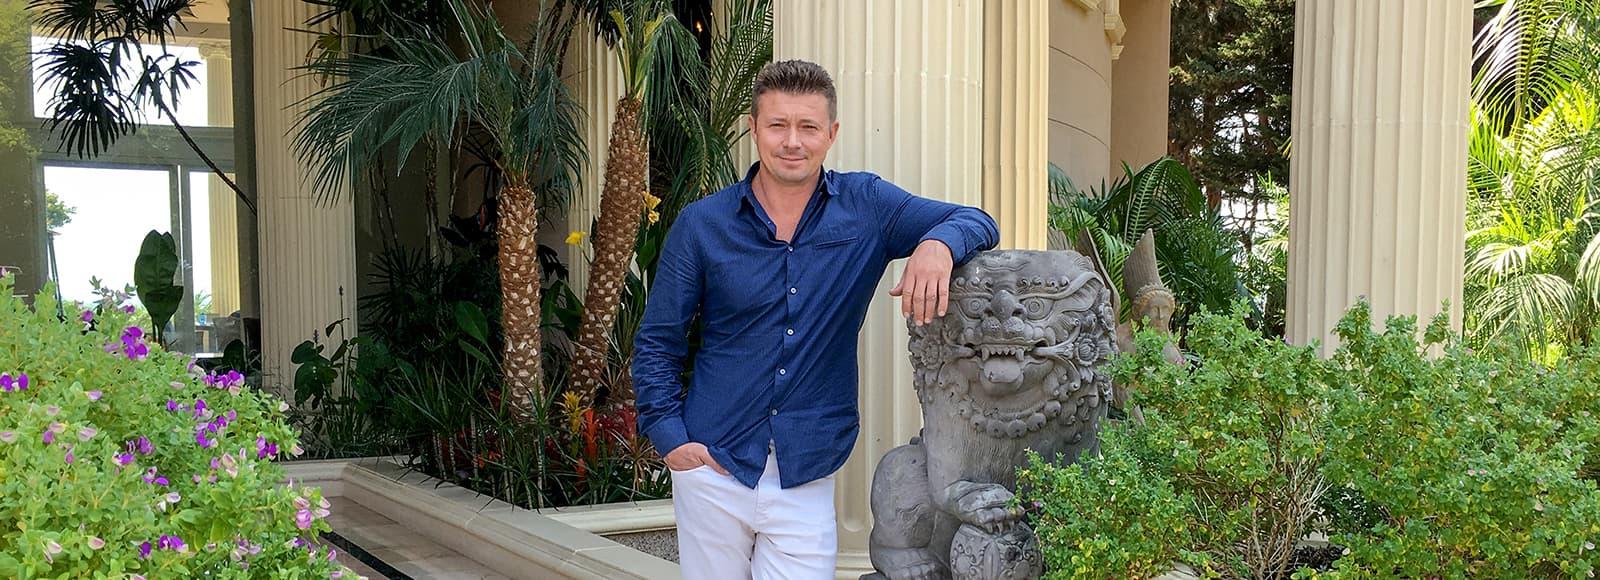 Meet Pax Prentiss, CEO of Passages Ventura